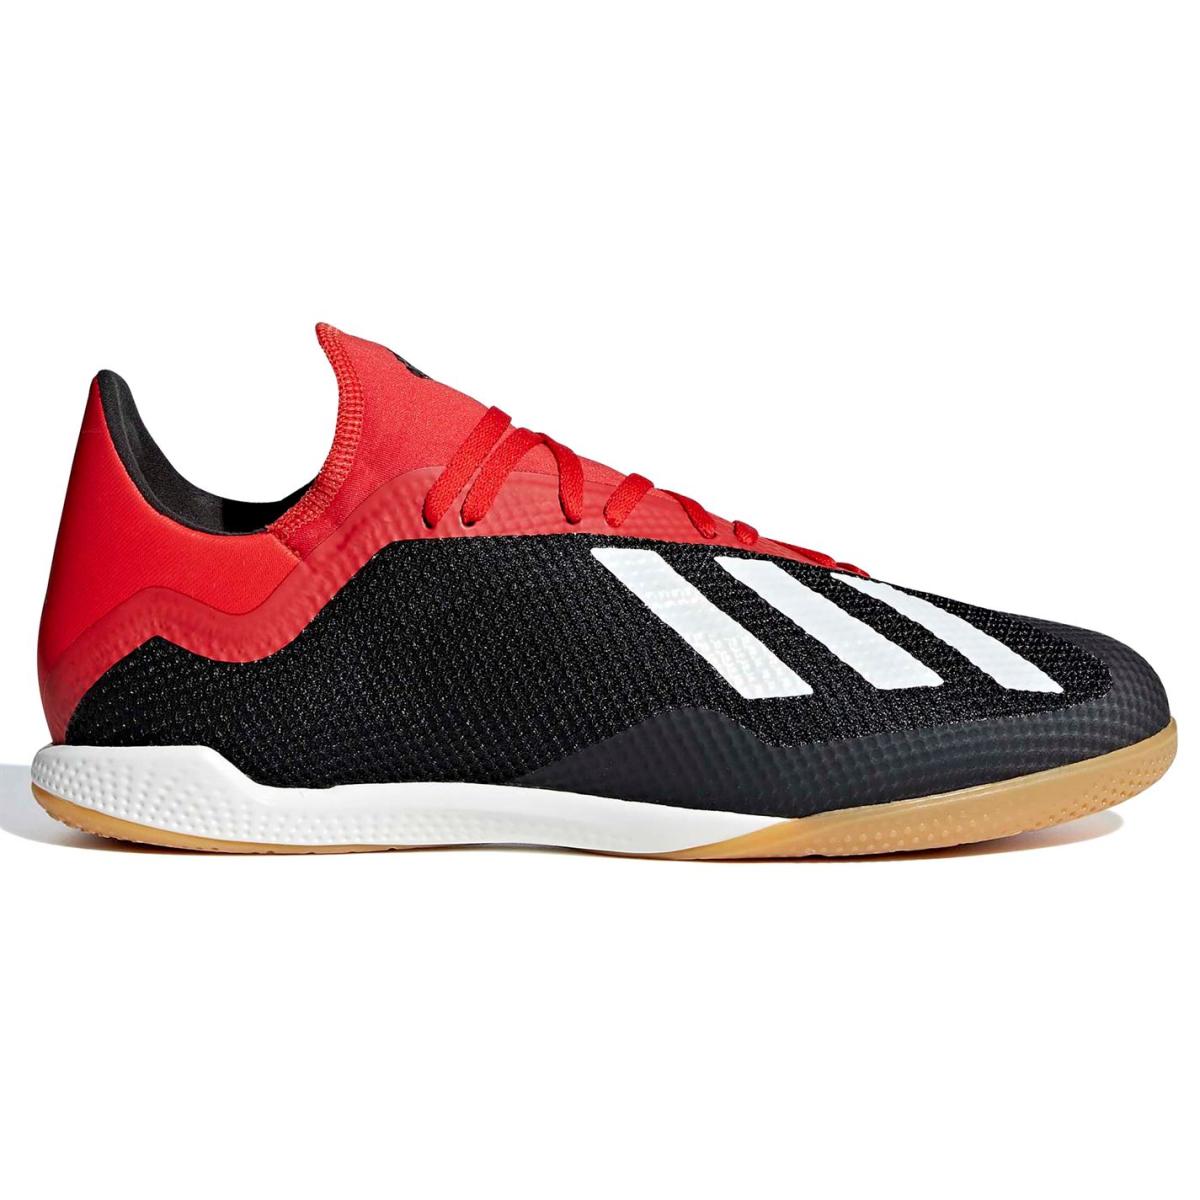 adidas X Tango 18.3 Herren Indoor Fußballschuhe Schwarz_Wht_Rot